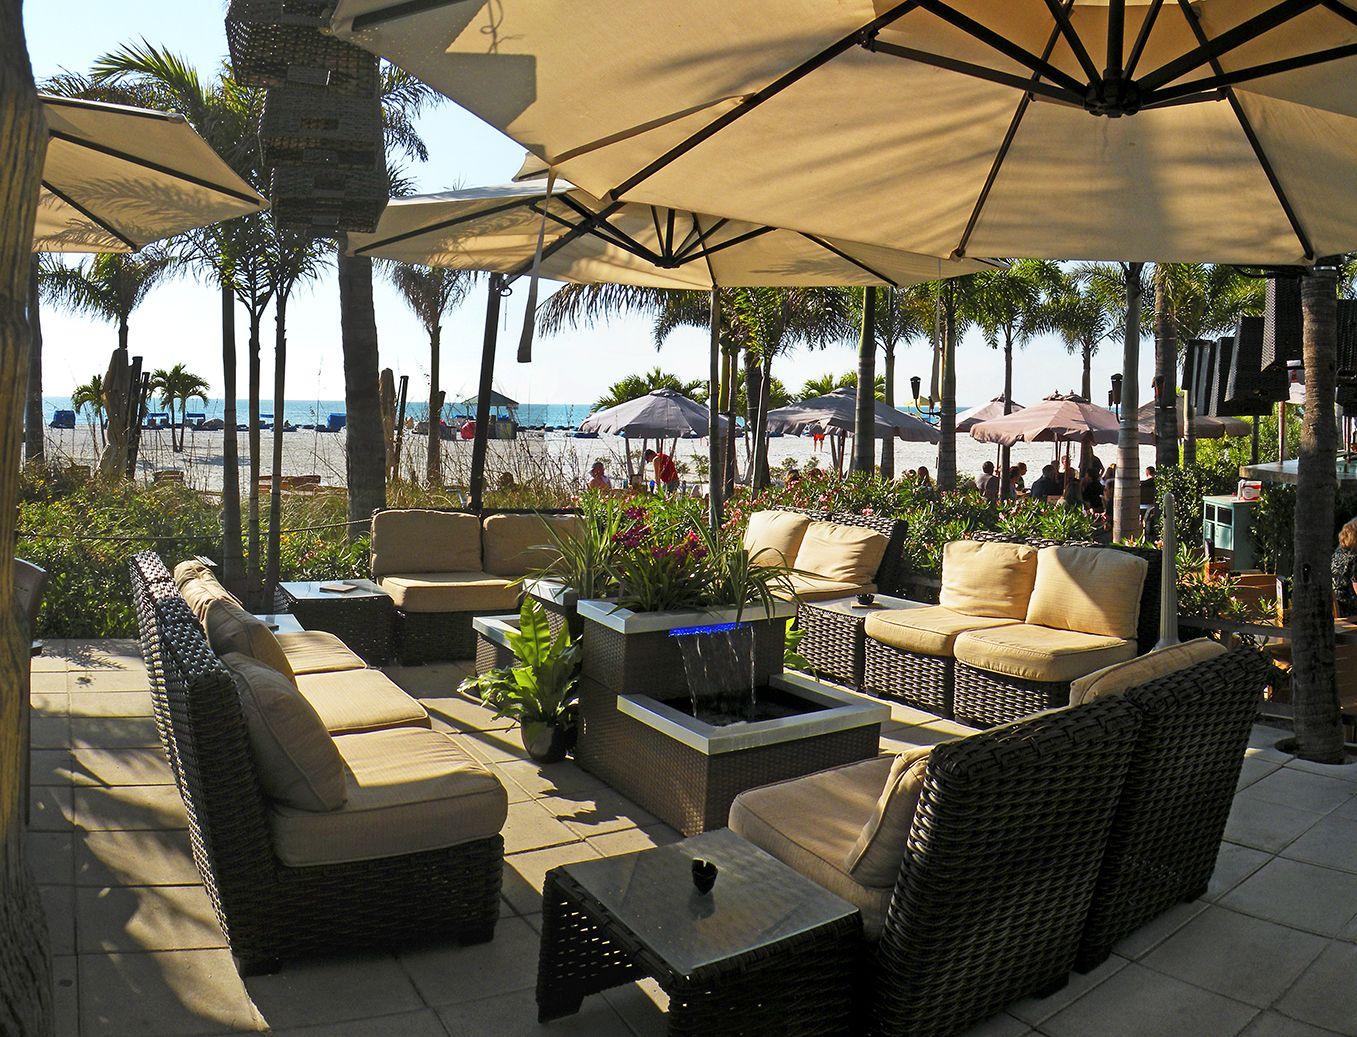 Bongos Beachside Bar Grand Plaza Resort. St Pete Beach